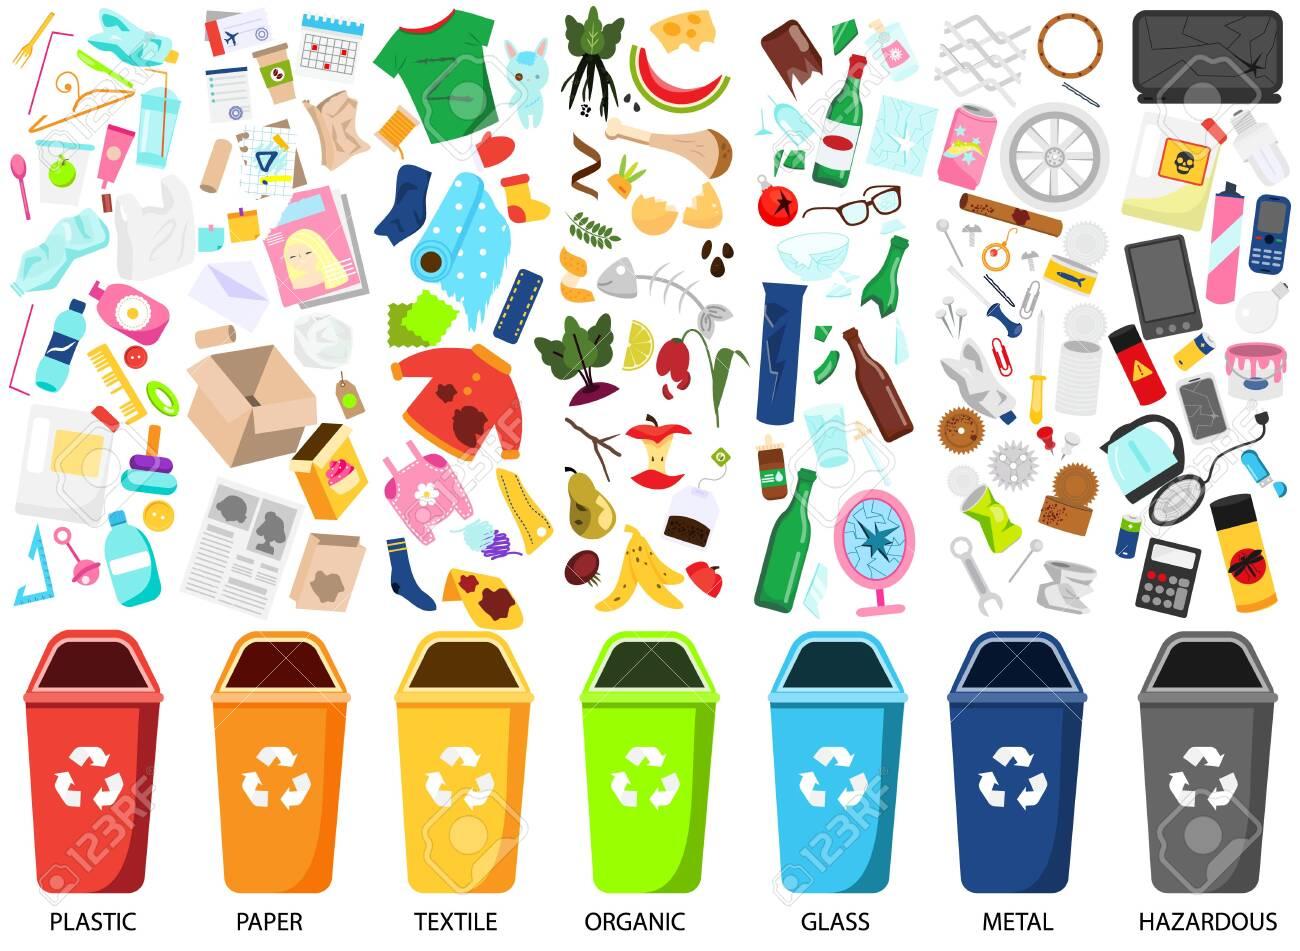 Waste sorting. Big collection of garbage types. Organic, paper, metal, hazardous, textile, glass, plastic trash icons, bins - 122279262